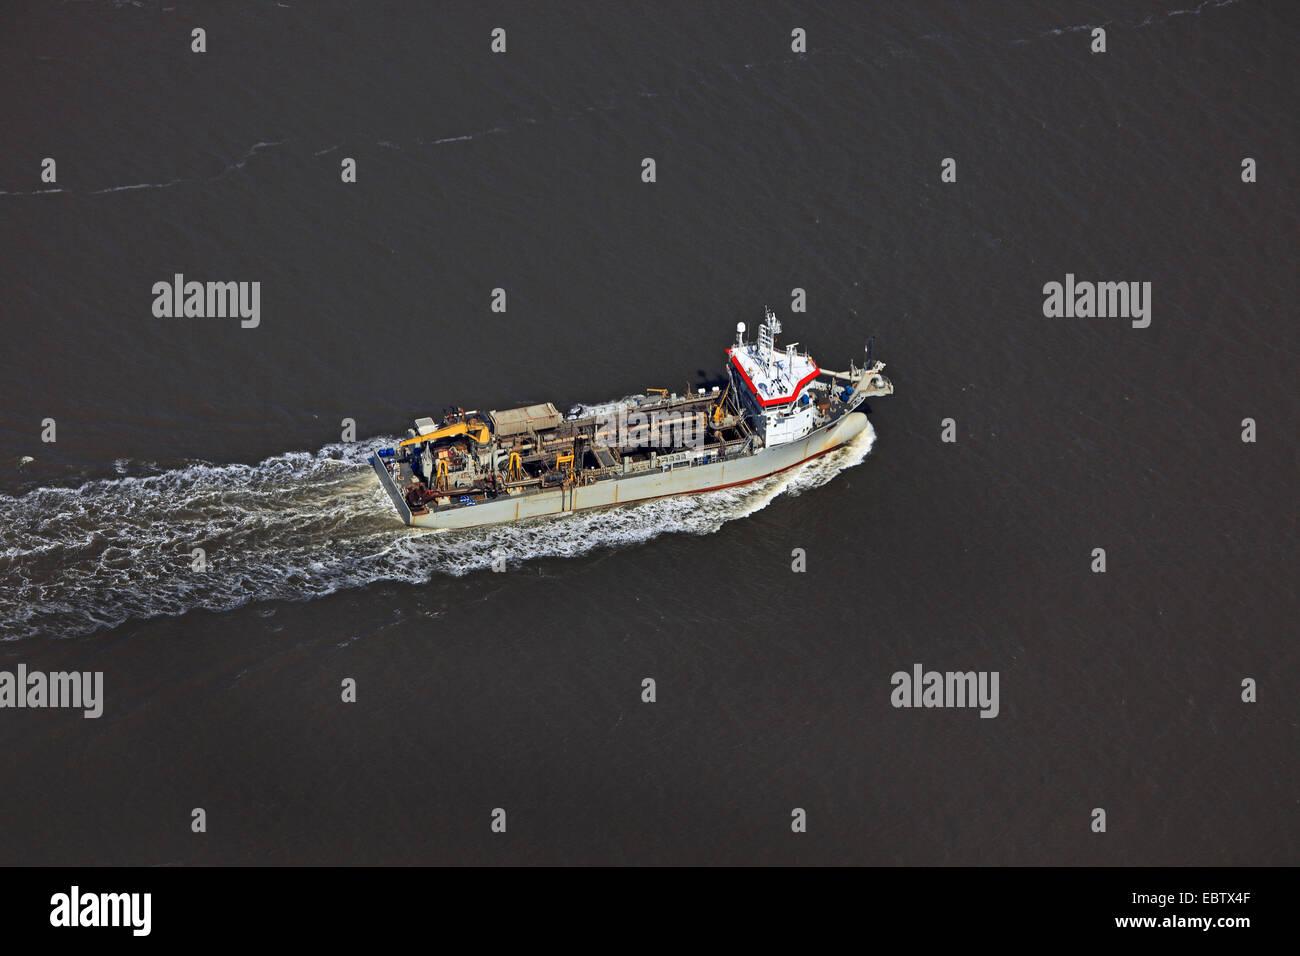 dredging vessel on river Elbe, Germany, Cuxhaven - Stock Image